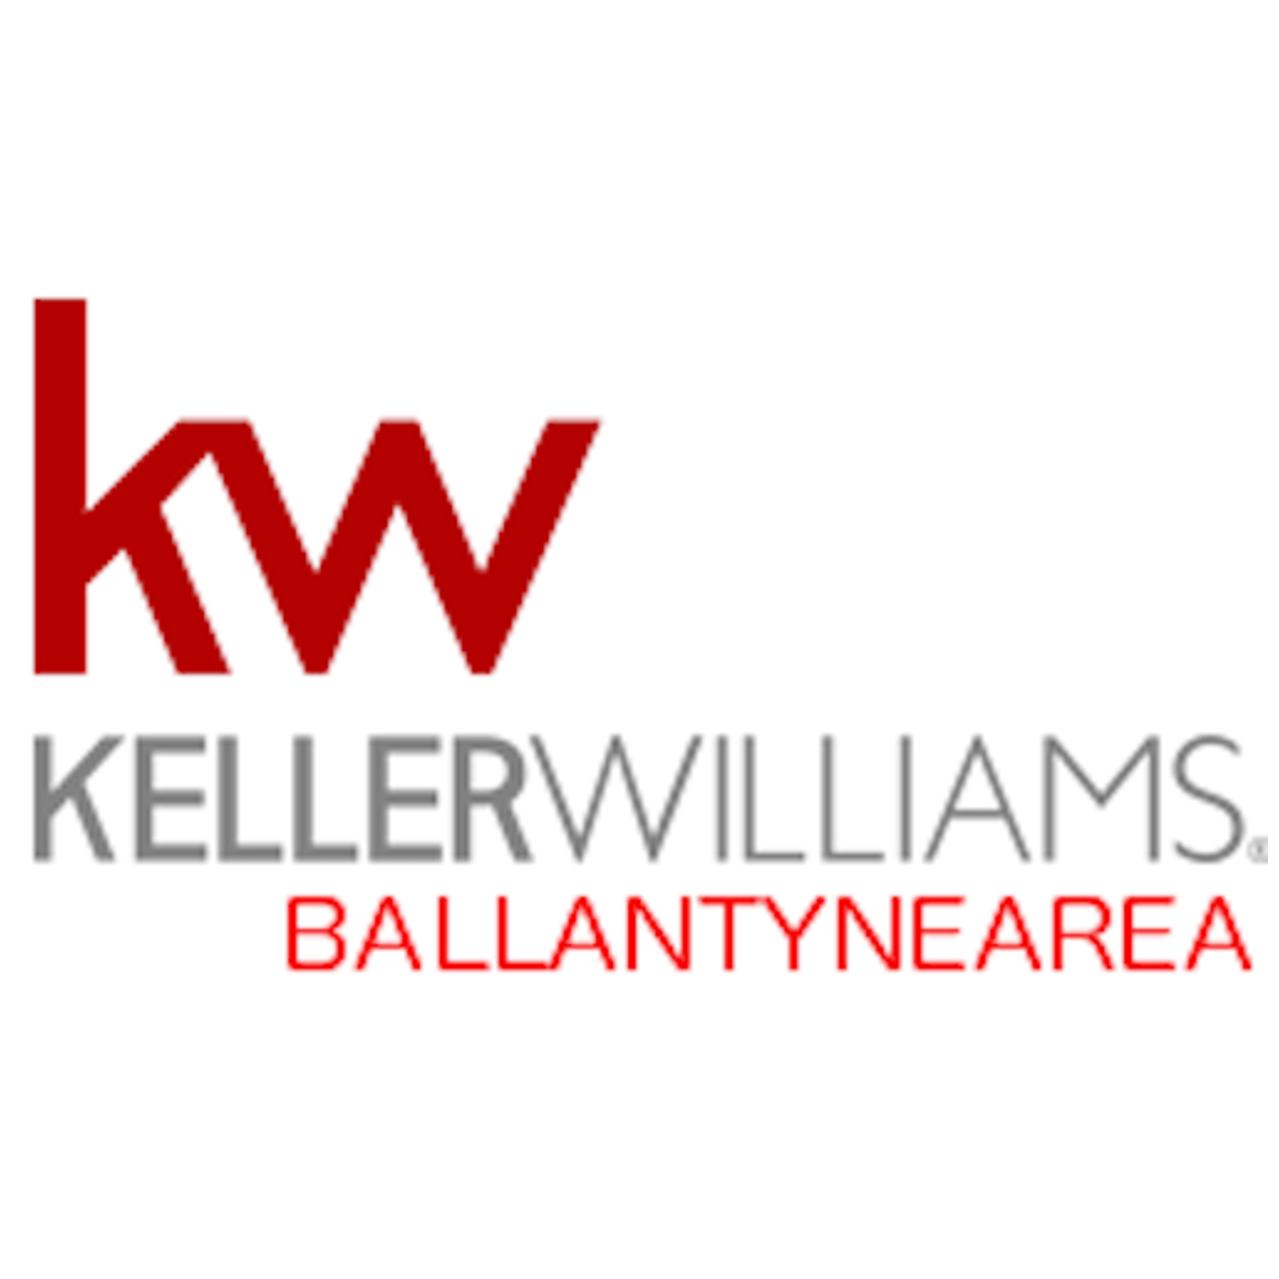 Brian Richardson - Keller Williams - Ballantyne Area